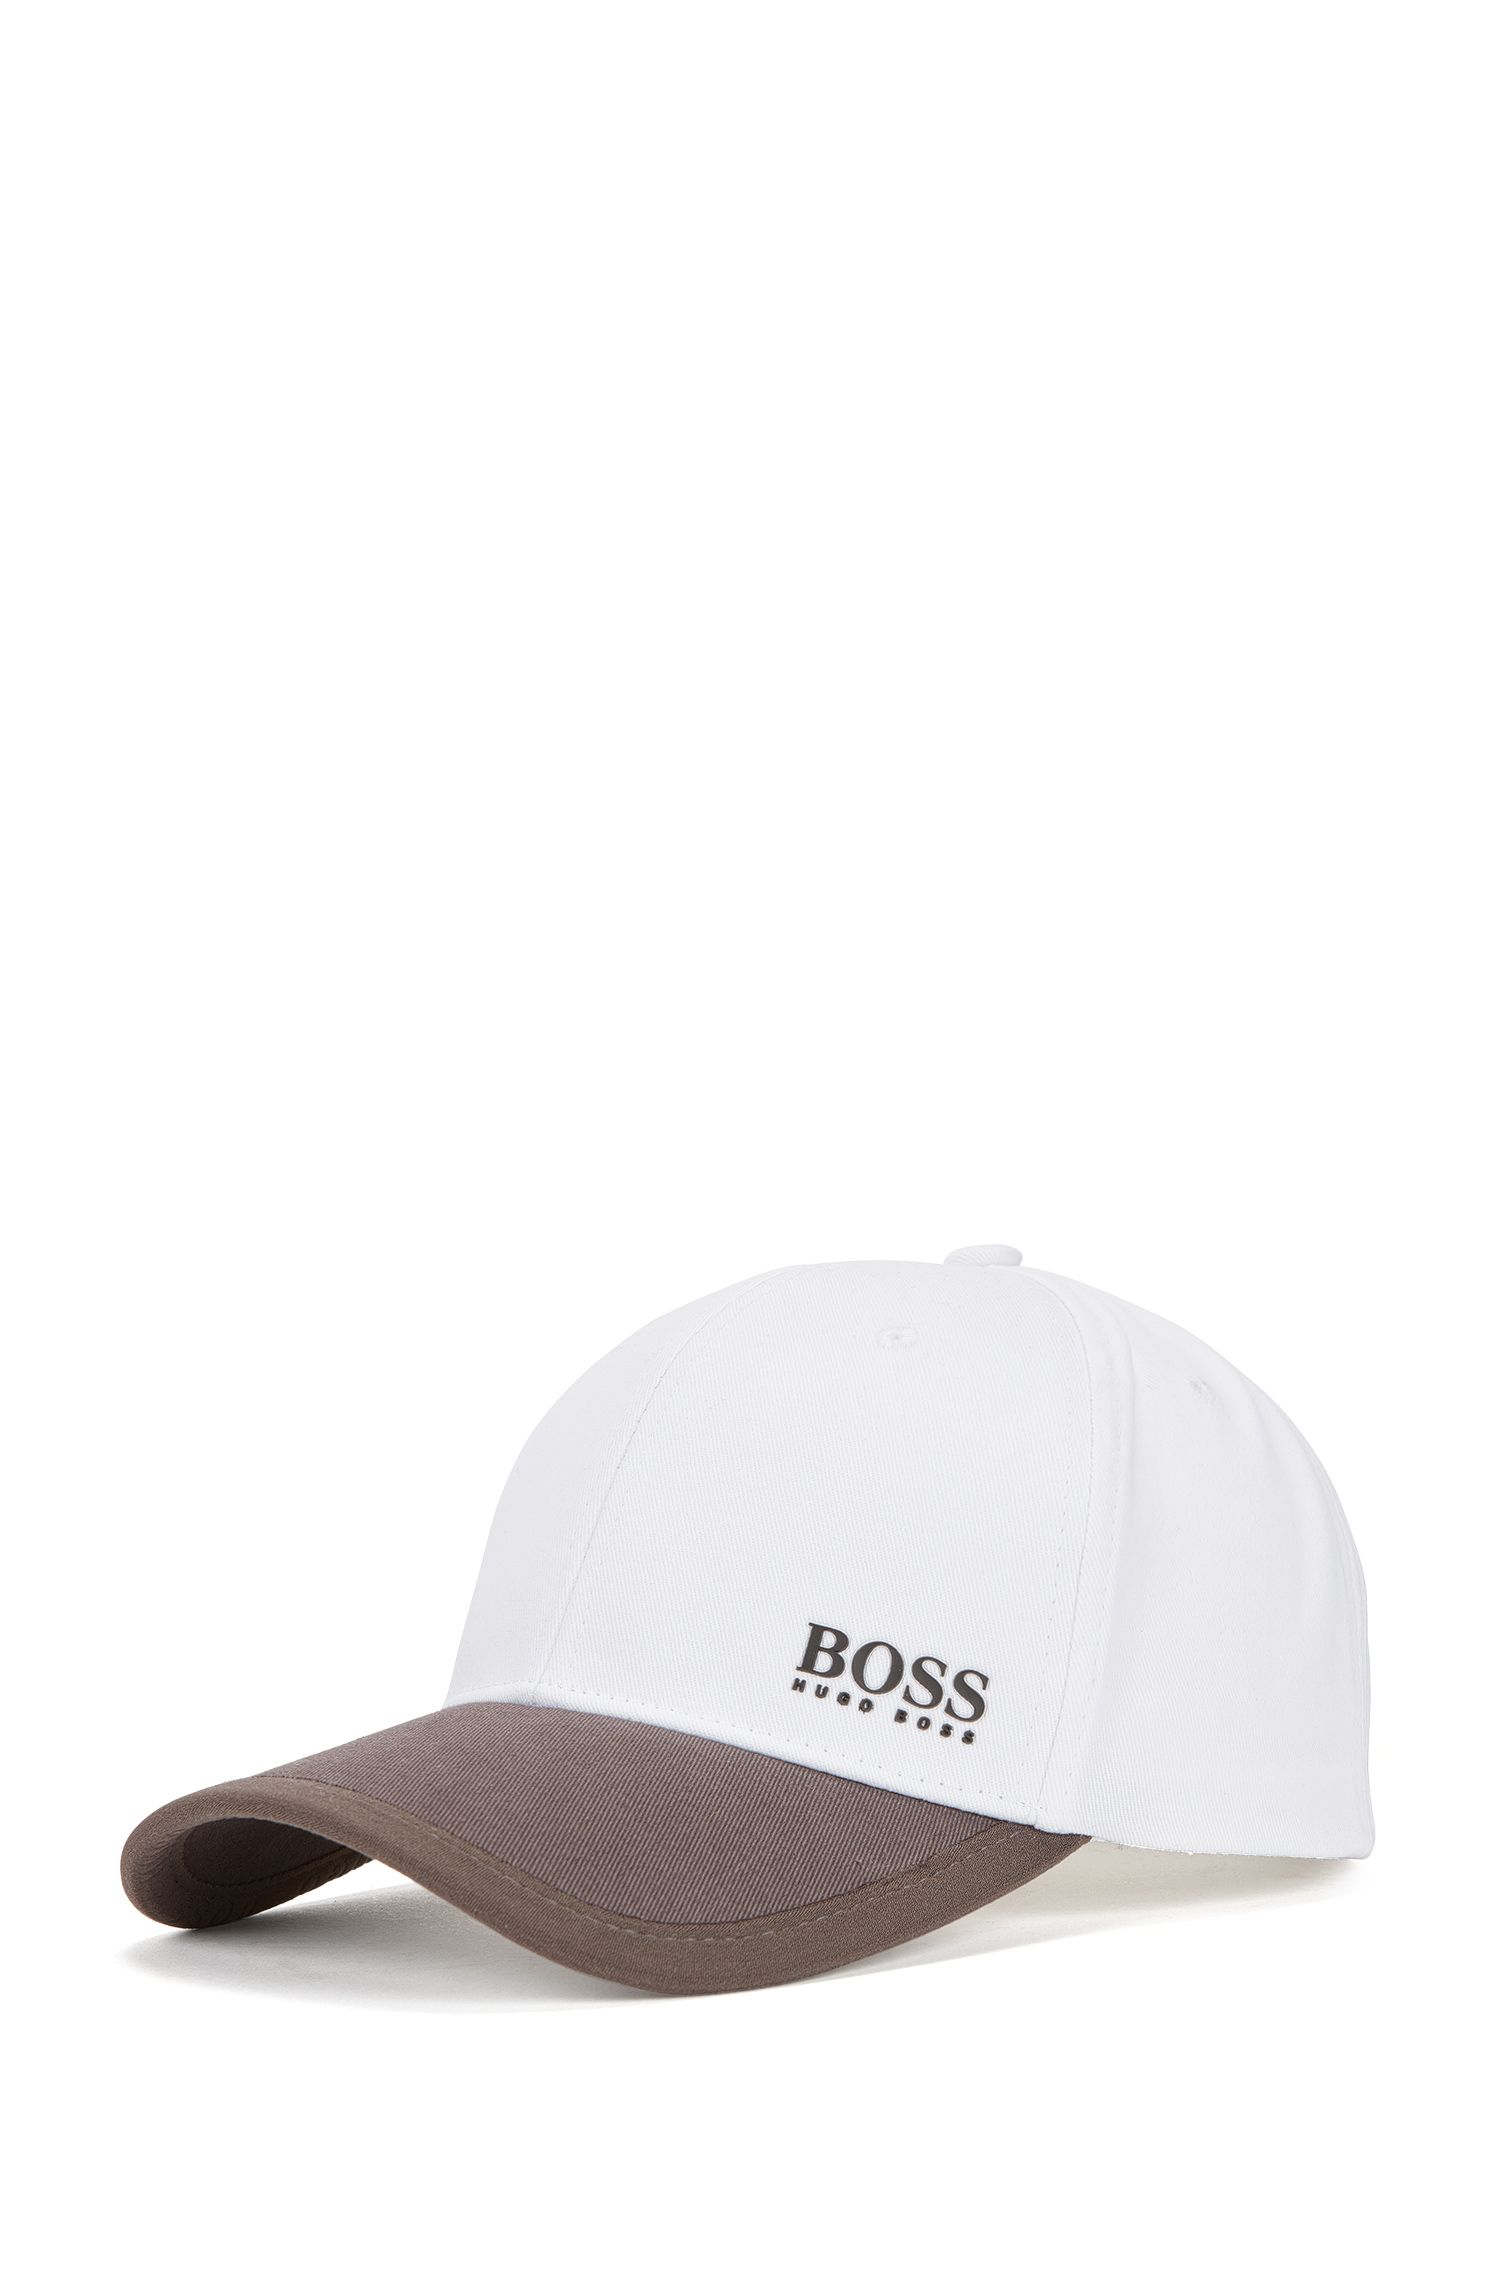 Cotton Twill Baseball Cap | Cap